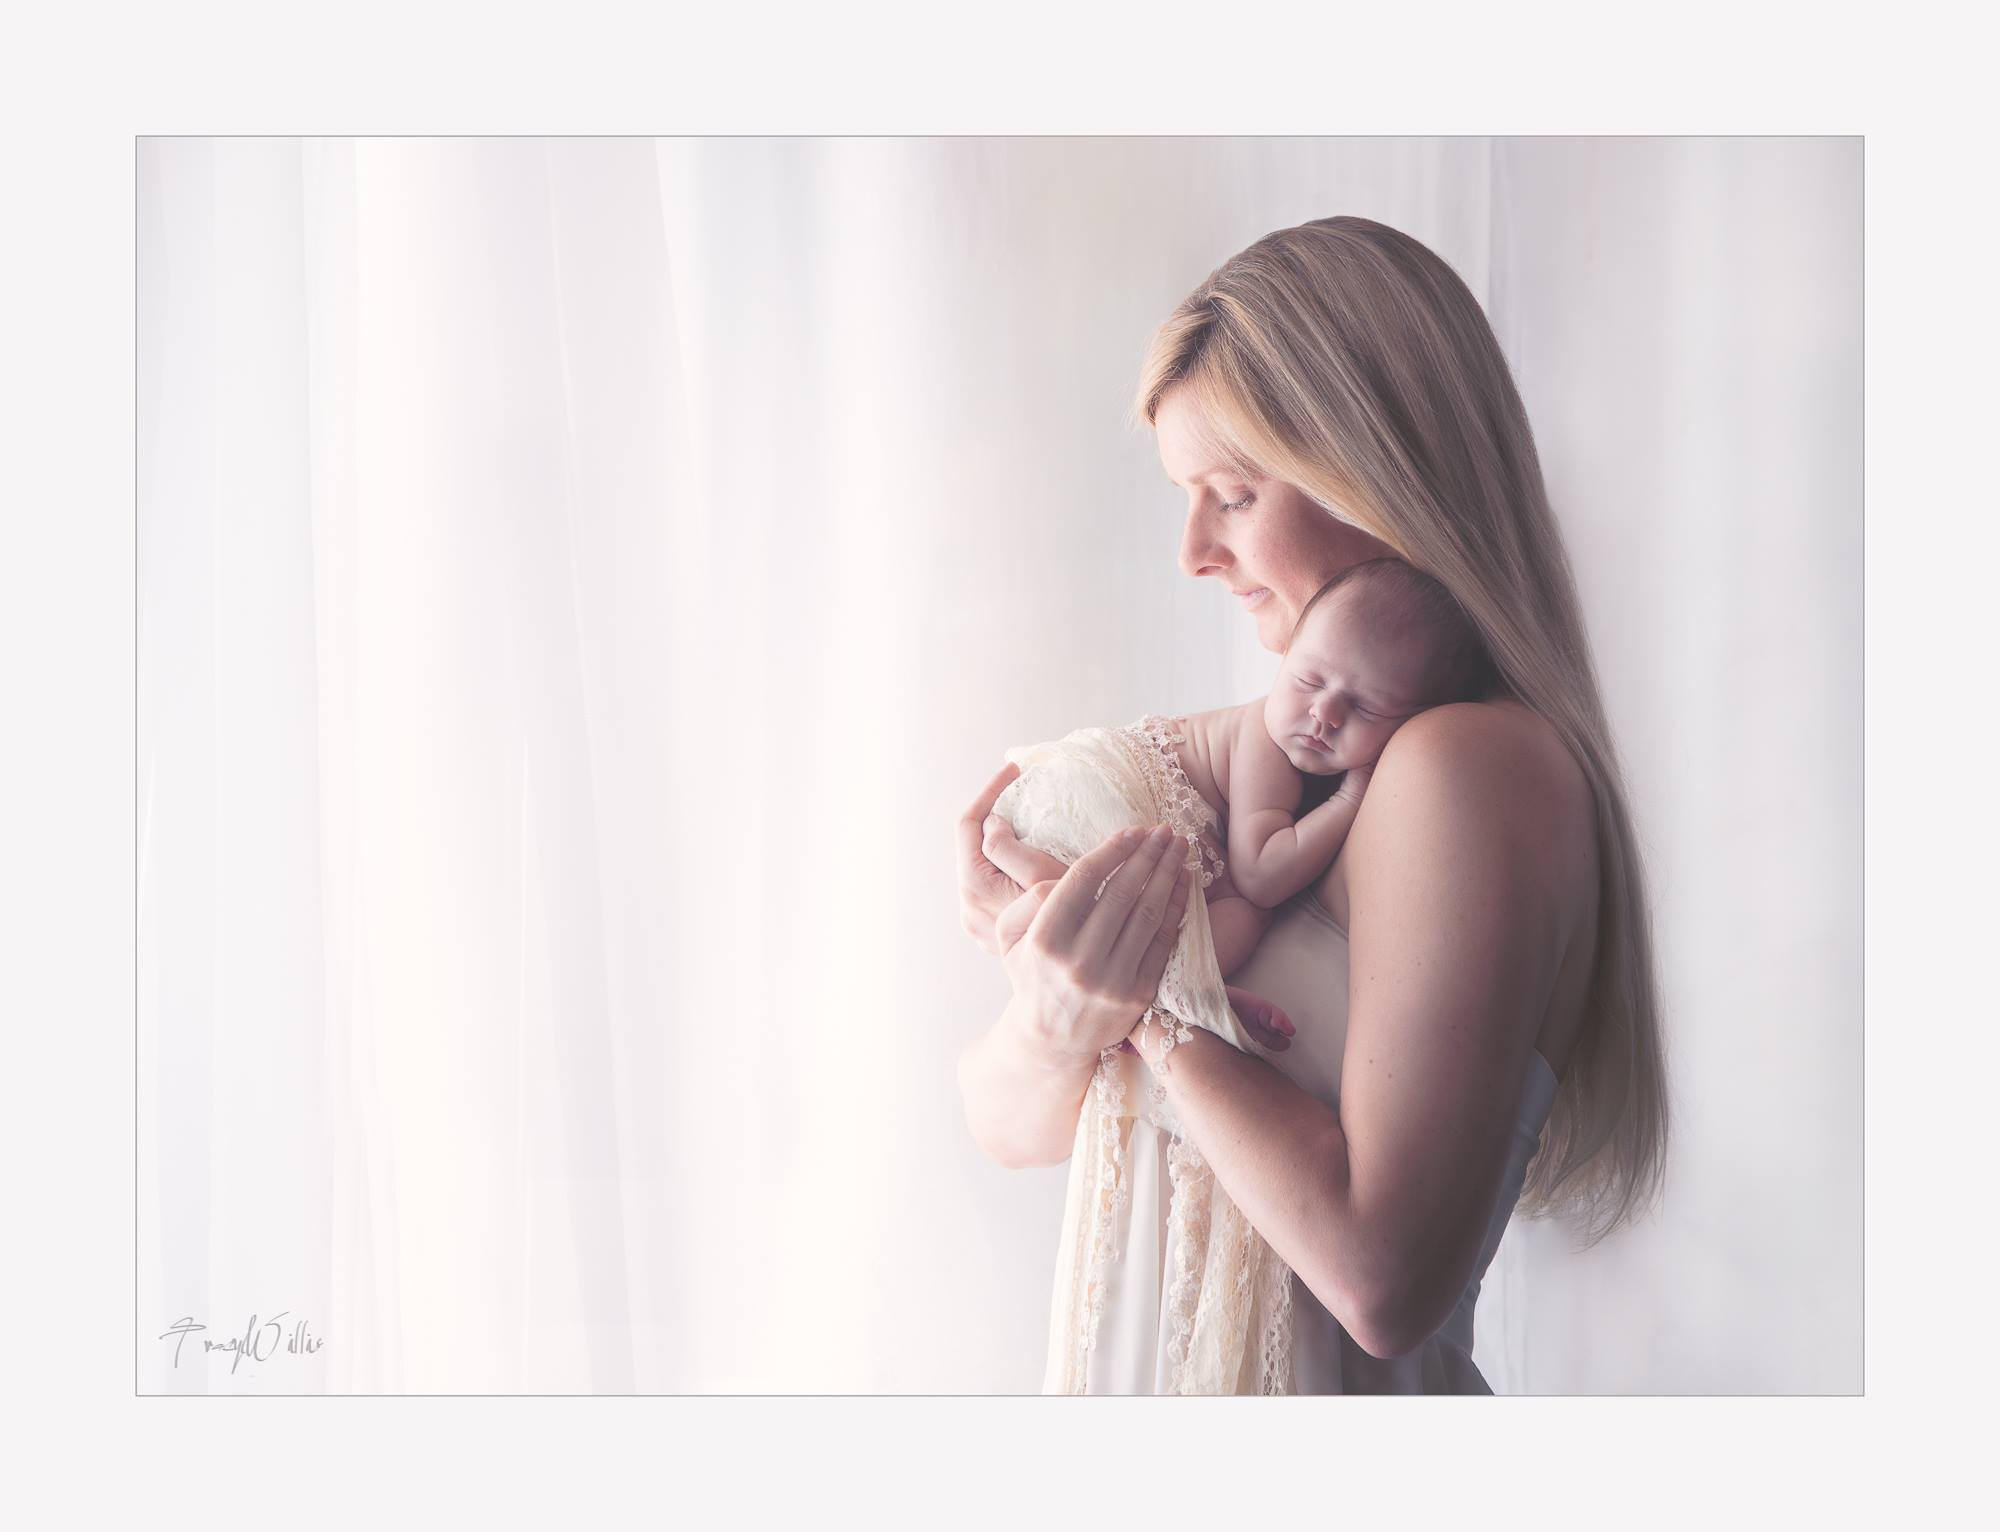 Mum and baby beautiful newborn photography - Bournemouth photography